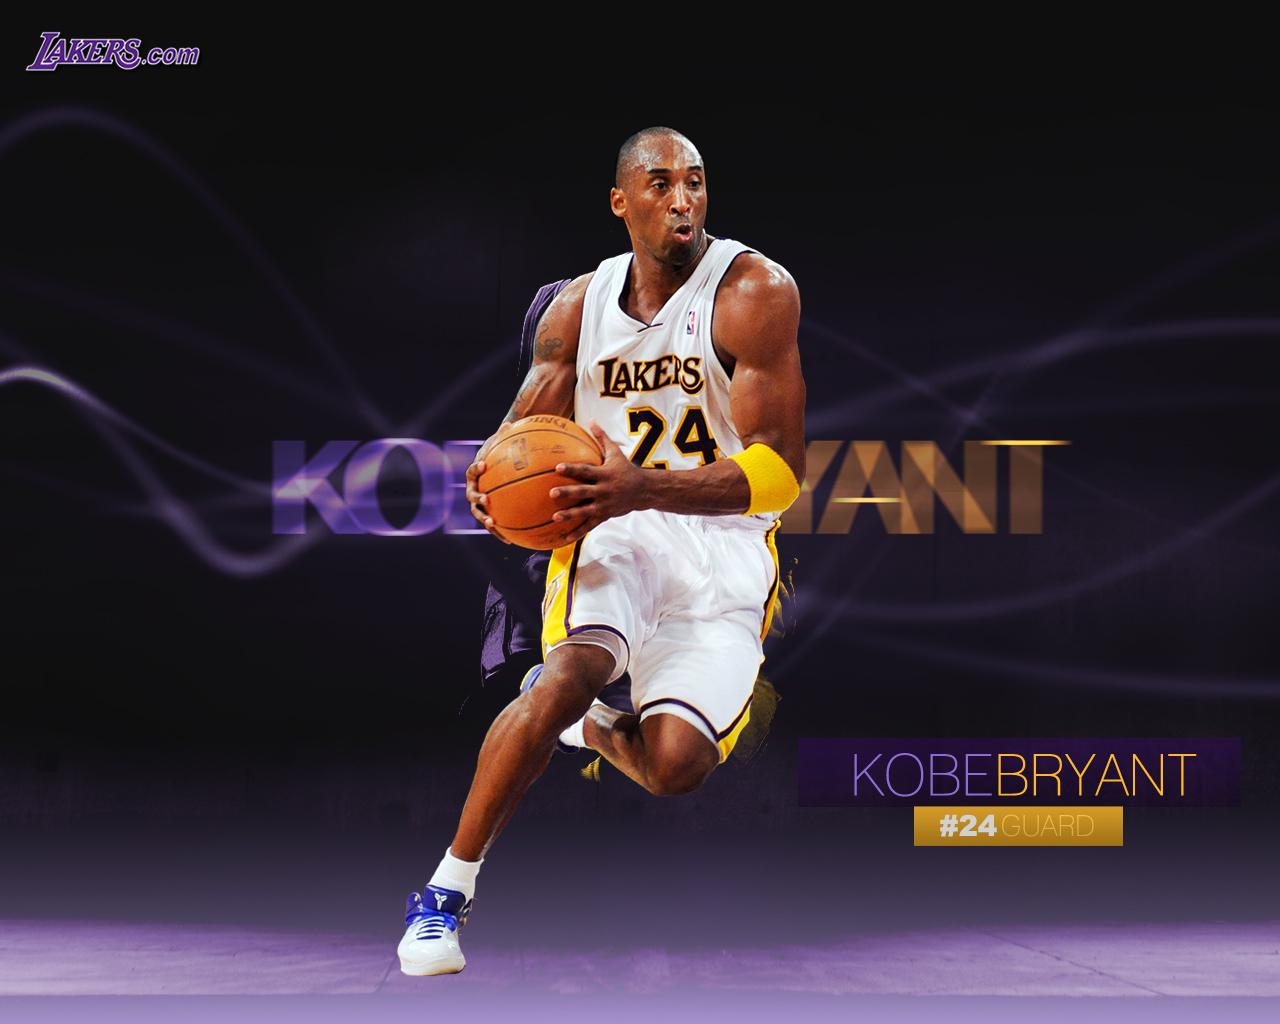 http://4.bp.blogspot.com/-sCIH5ZWtDsQ/T79V-DxY2TI/AAAAAAAABLg/_H8epYZ8oIU/s1600/Kobe-Bryant-Wallpaper.jpg